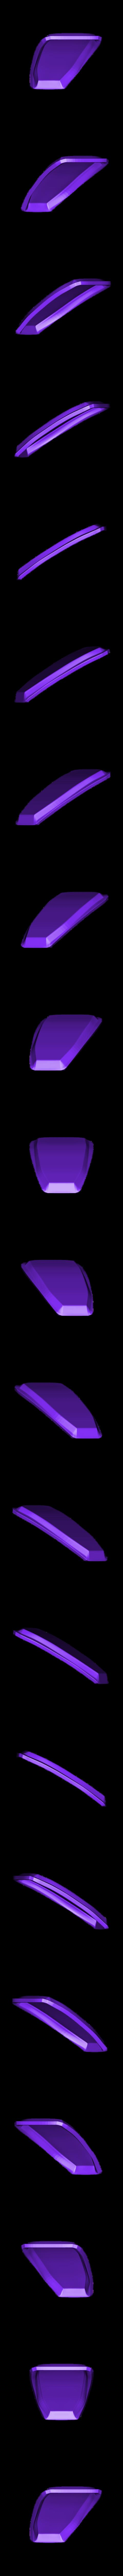 Lucio_modeLens.stl Download free STL file Overwatch Lucio Blaster • 3D printer object, Adafruit